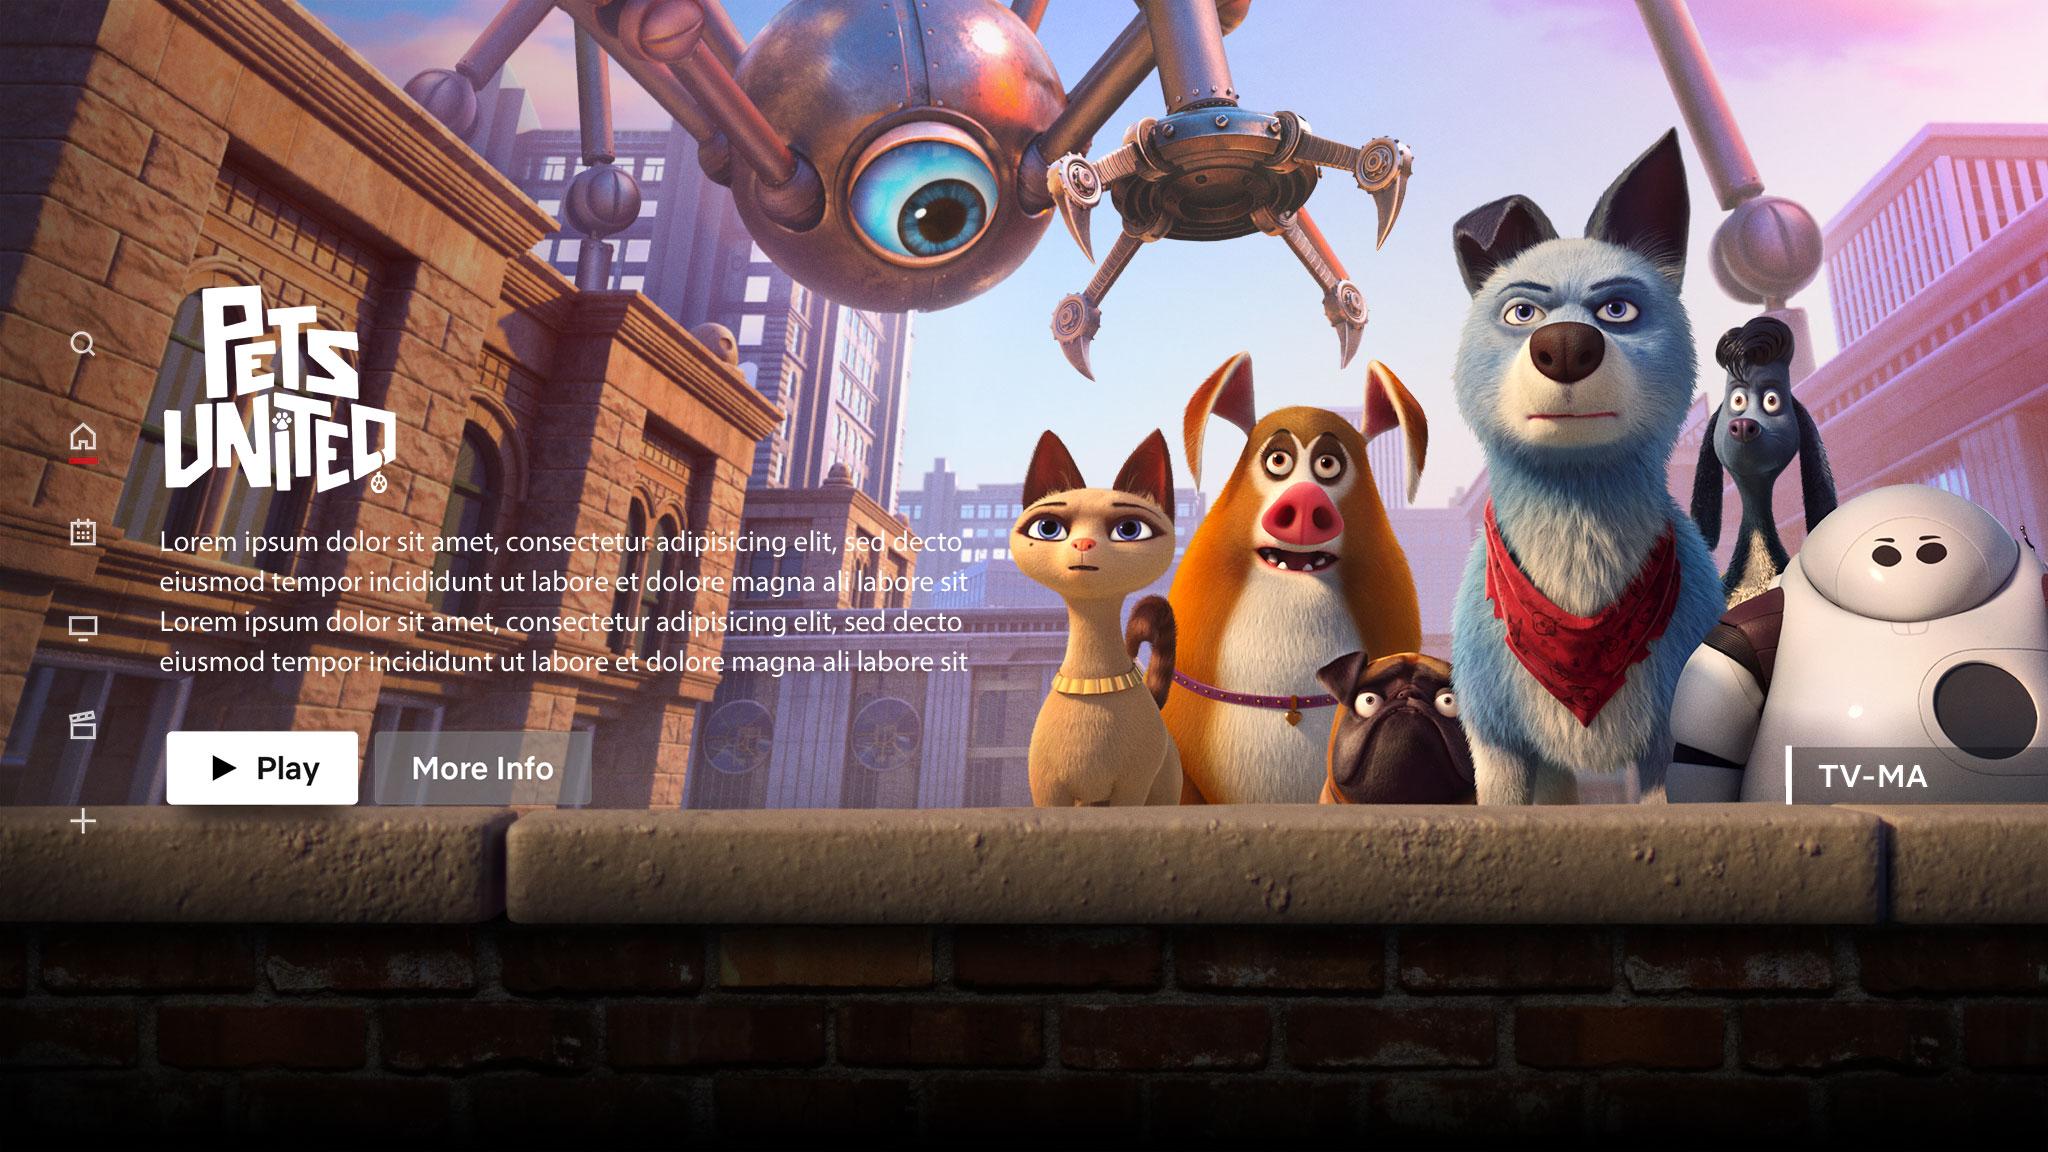 Pets United | Netflix Billboard Concept, Finishing & Illustration